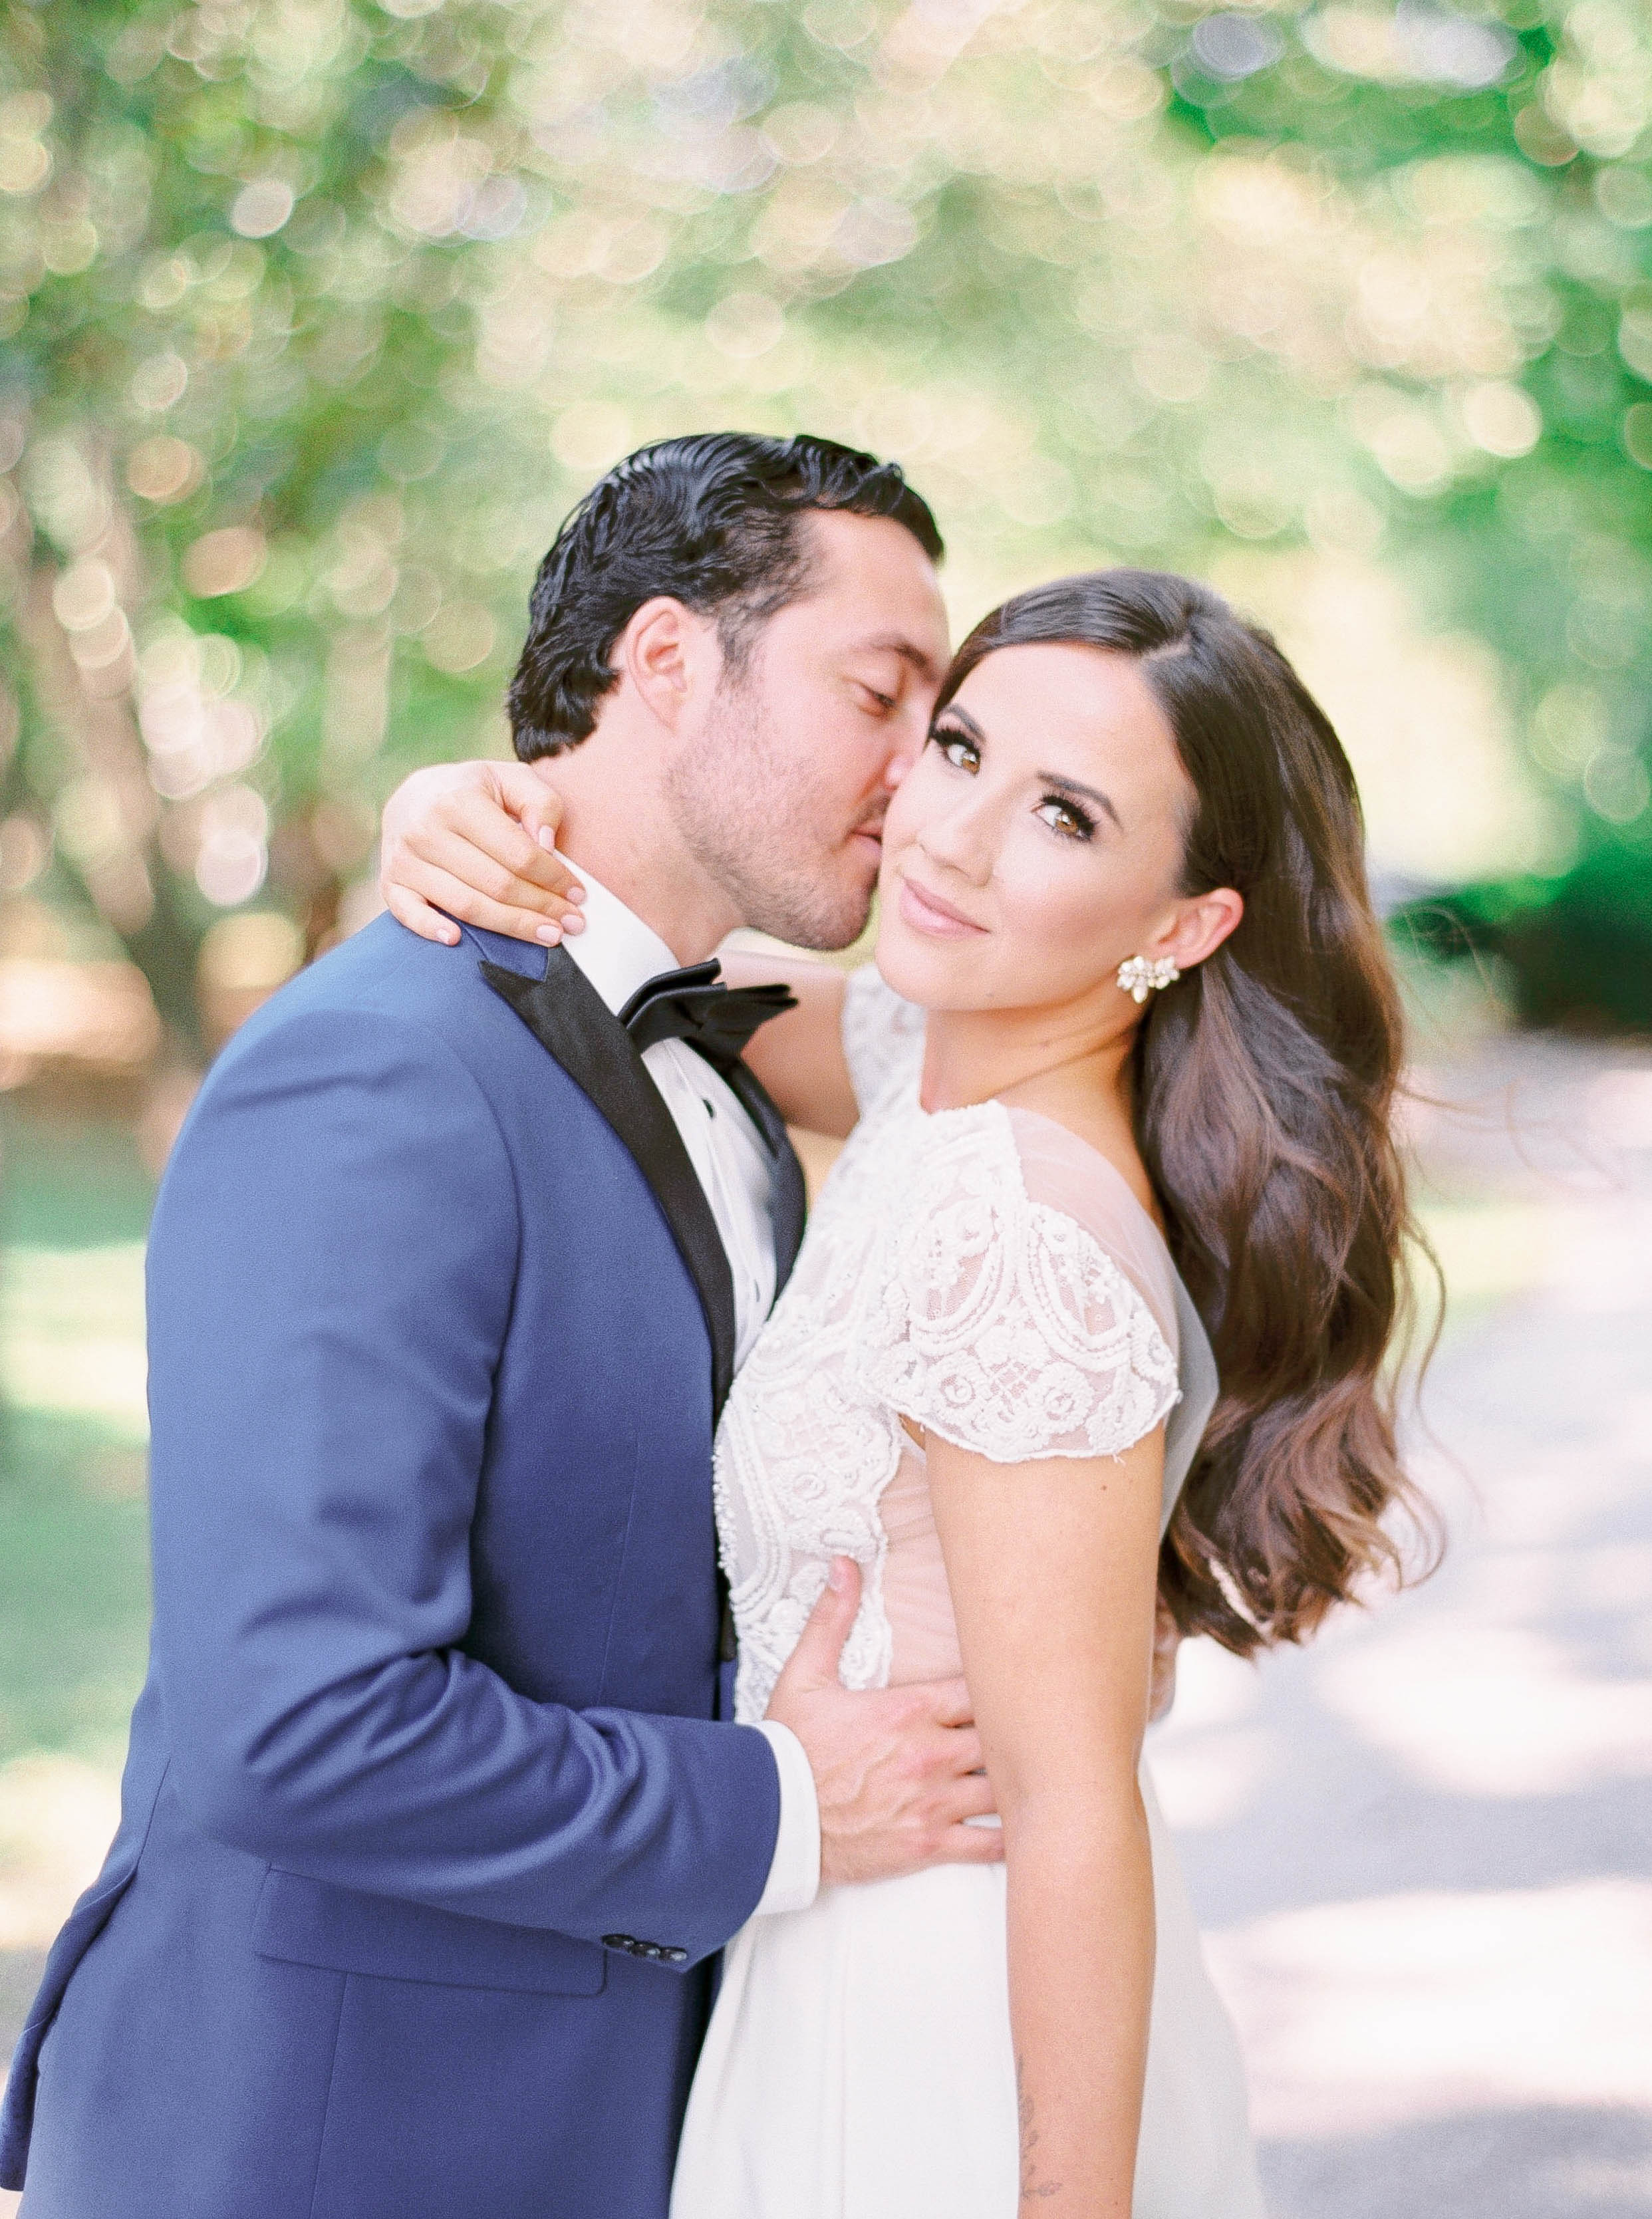 kurtz-gracewood-wedding-soft-airy-photographer-white-book-danielle-carmen-16.jpg